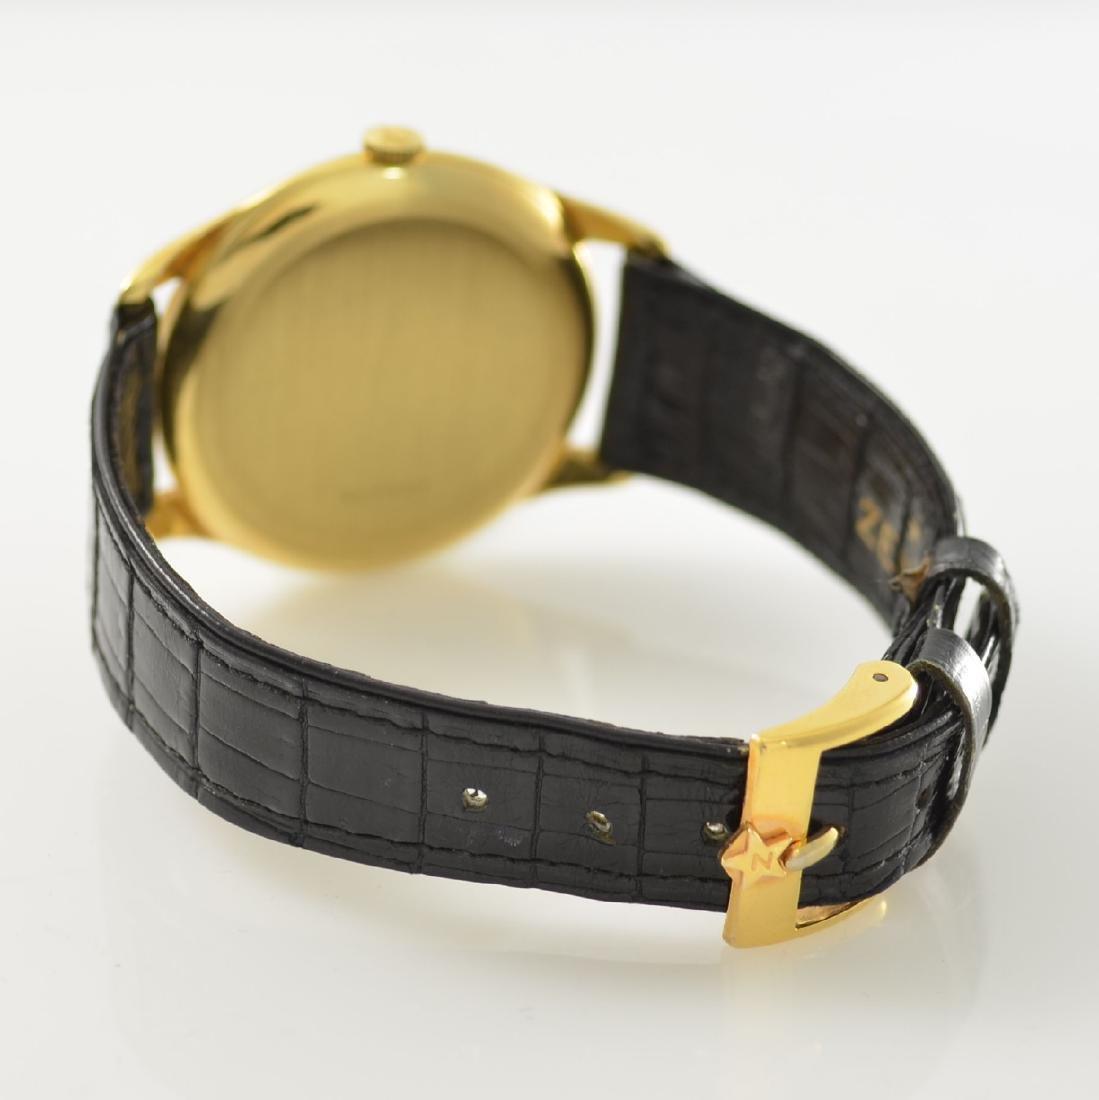 ZENITH oversized 18k yellow gold gents wristwatch - 5